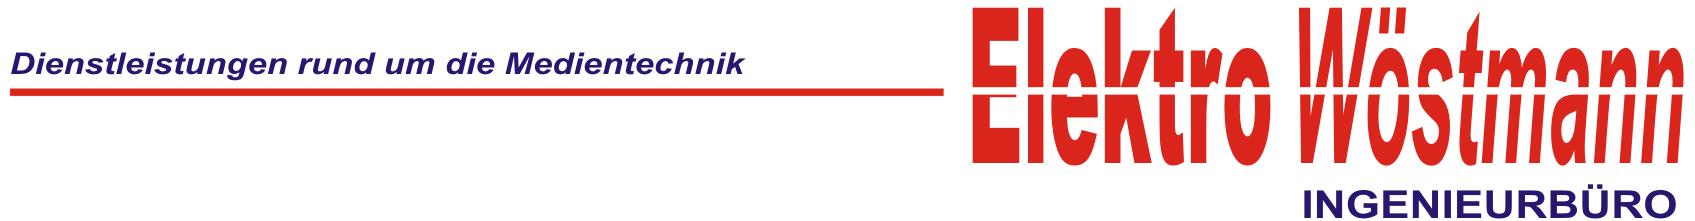 Elektro Wöstmann Logo